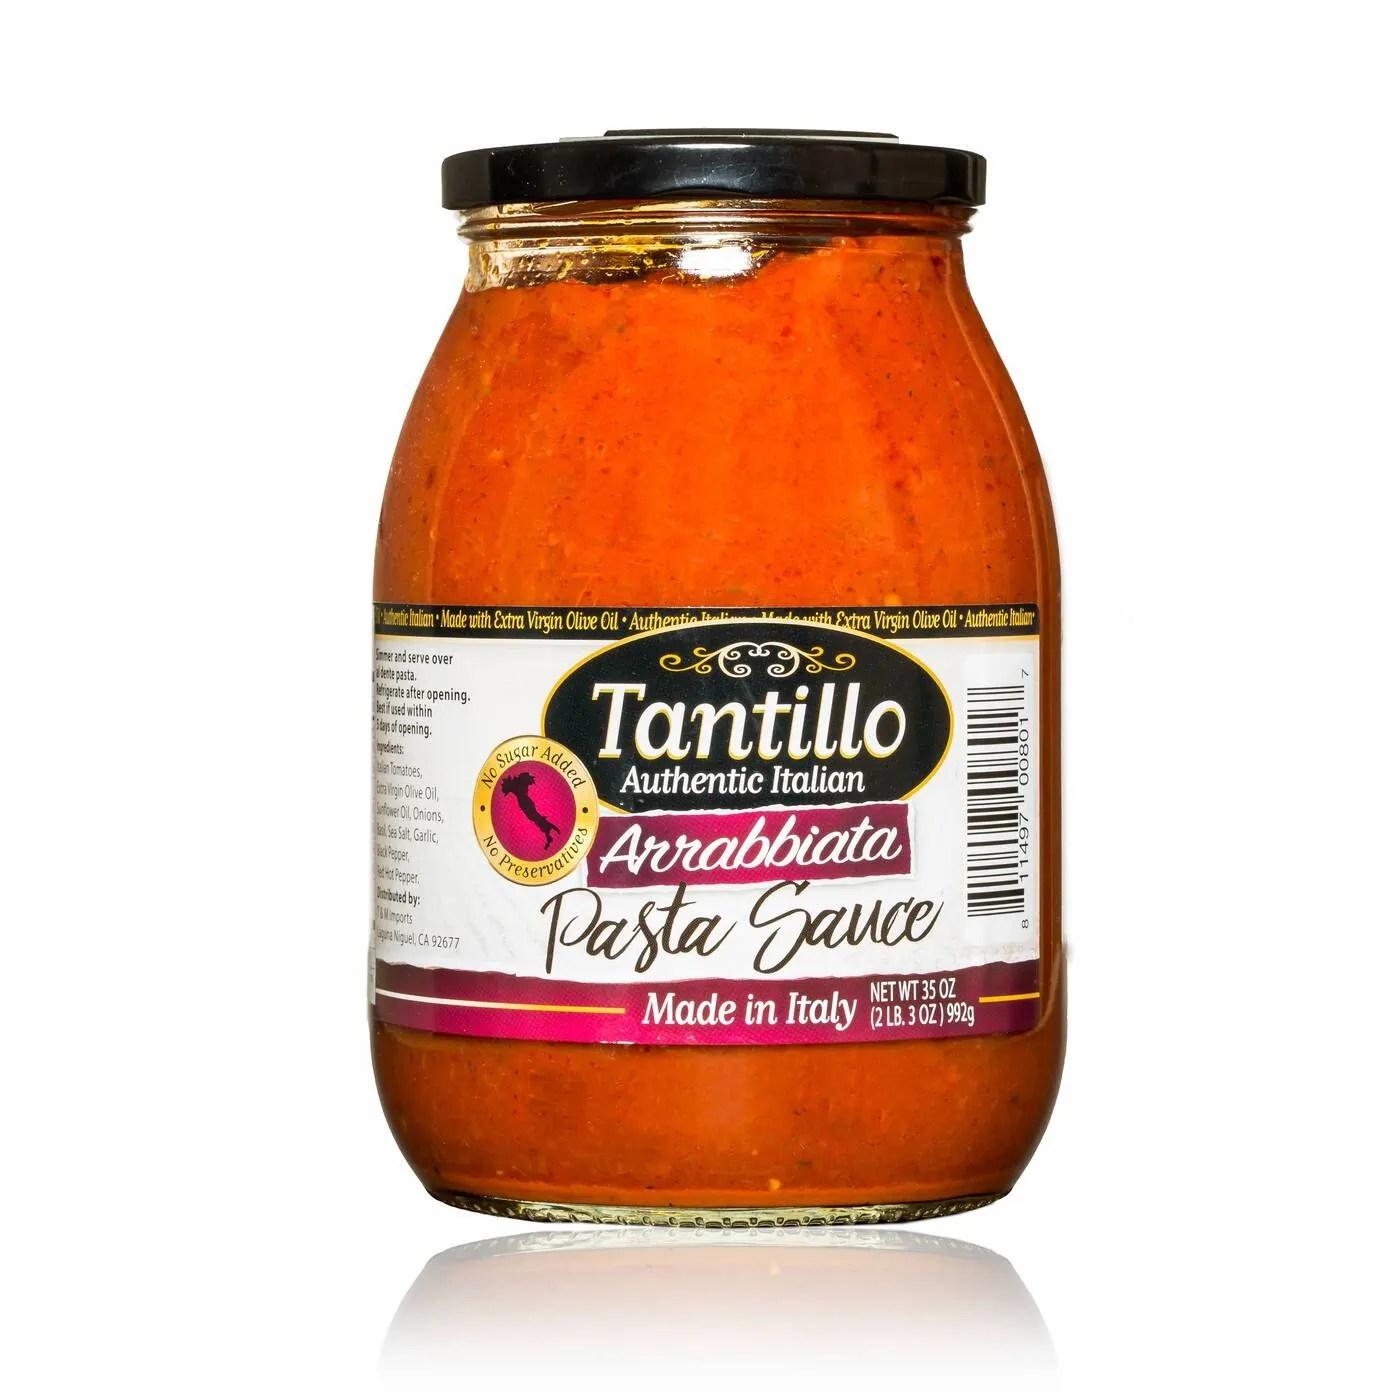 Tantillo Imported Italian Arrabbiata Pasta Sauce